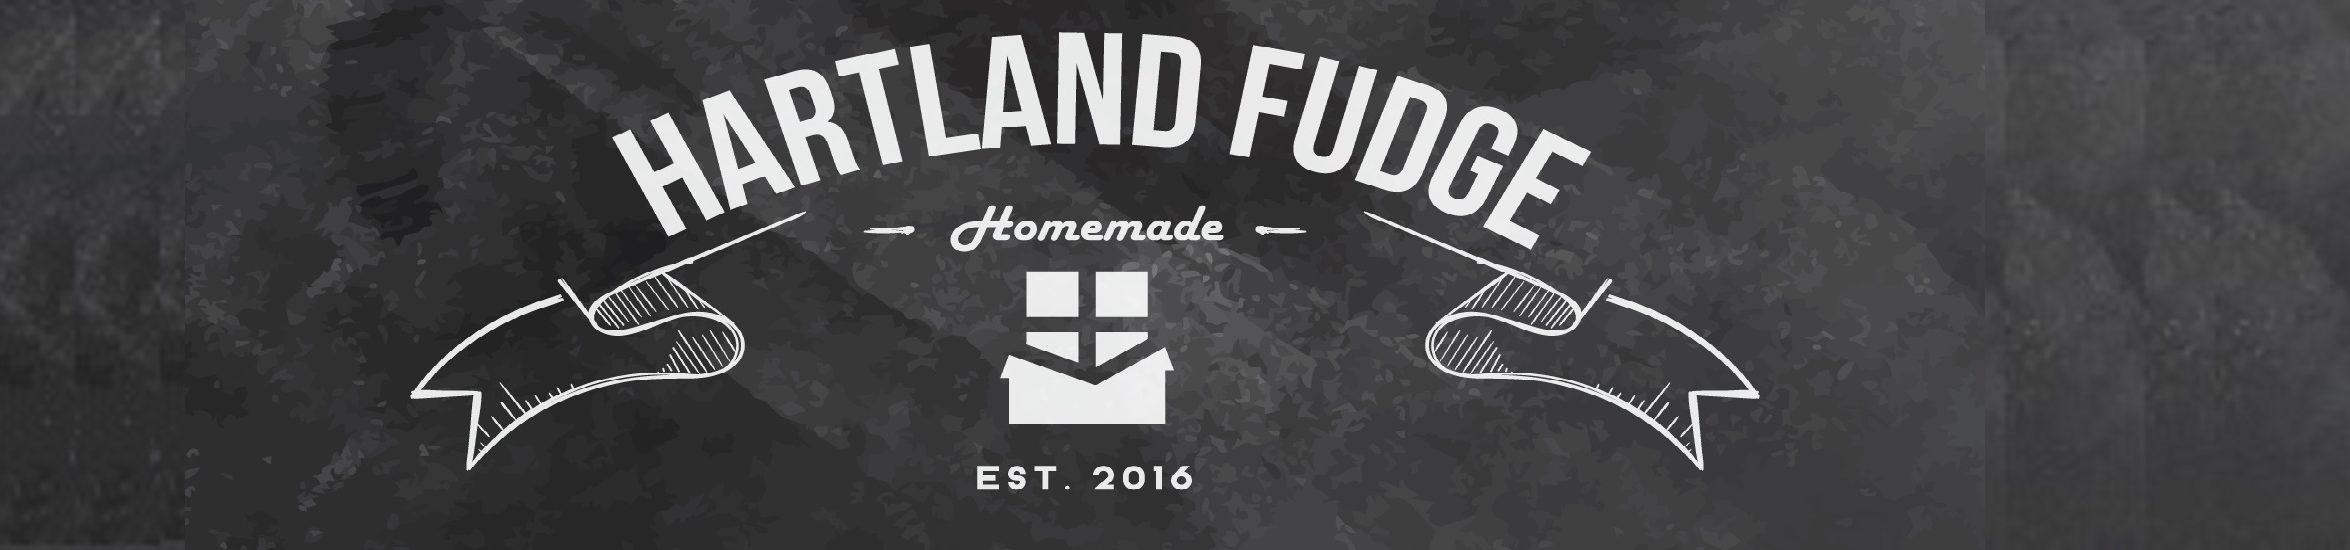 Hartland Fudge